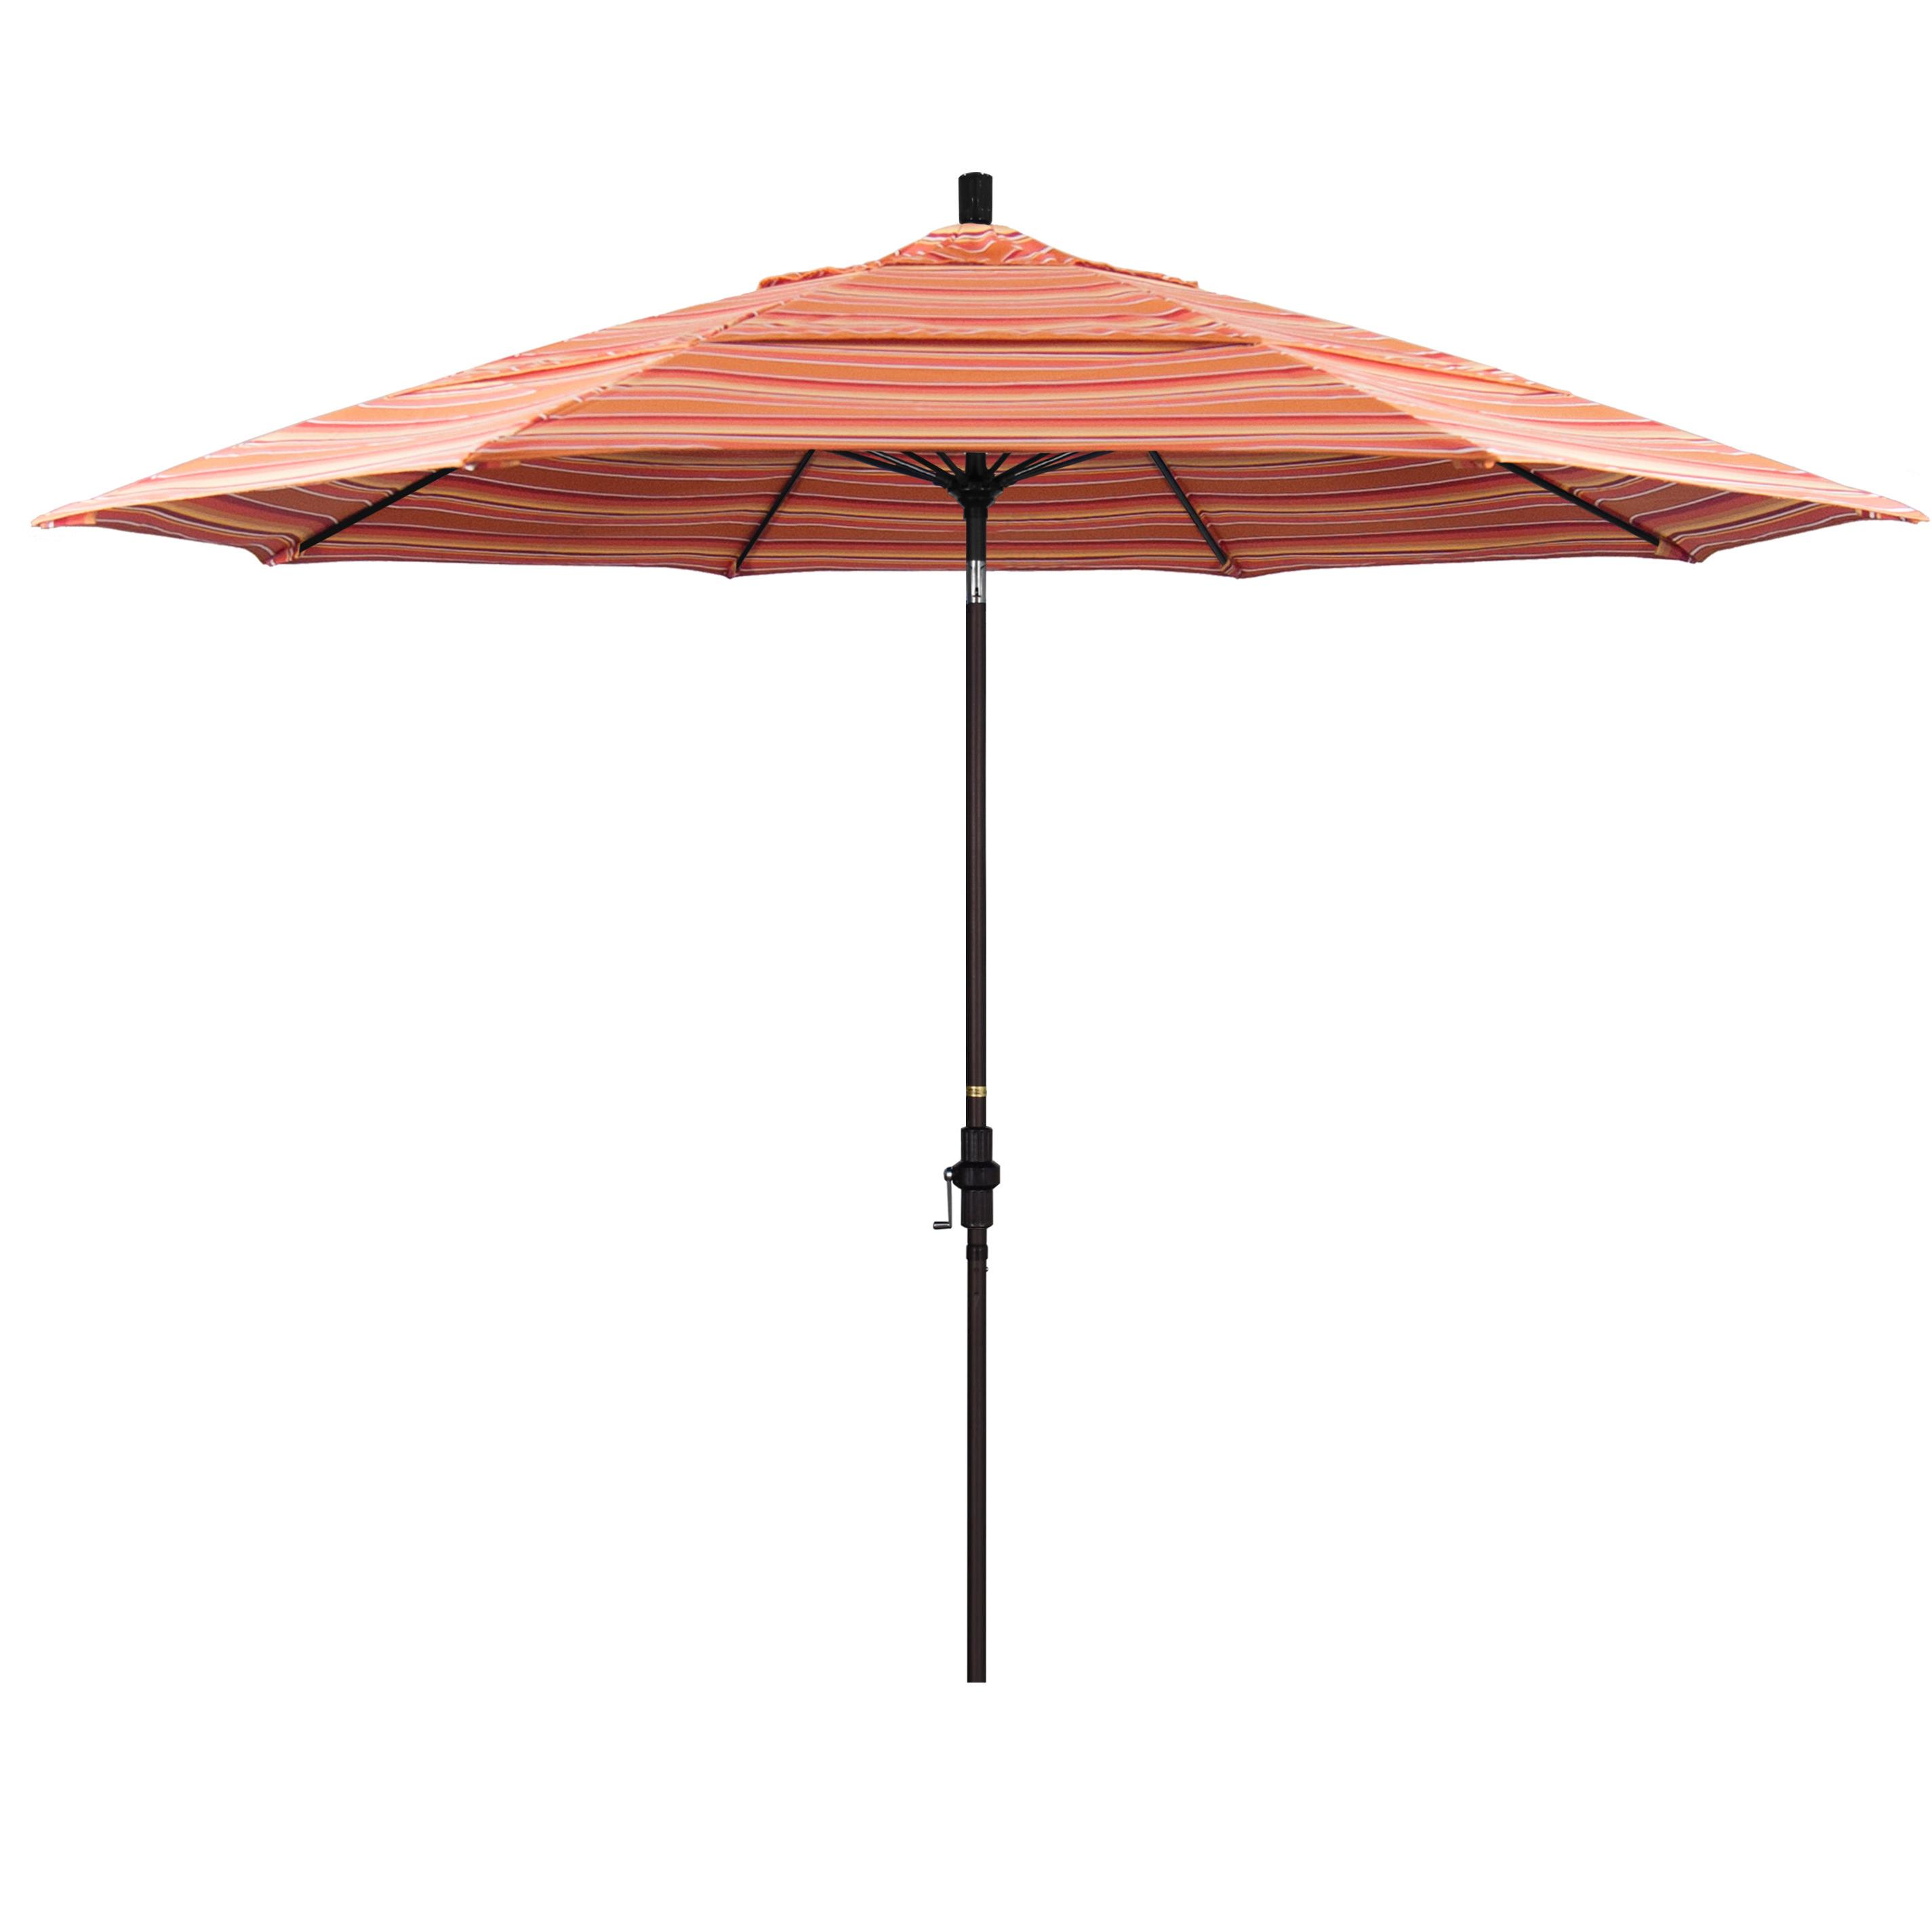 Current Muldoon 11' Market Sunbrella Umbrella With Wiebe Market Sunbrella Umbrellas (View 3 of 20)